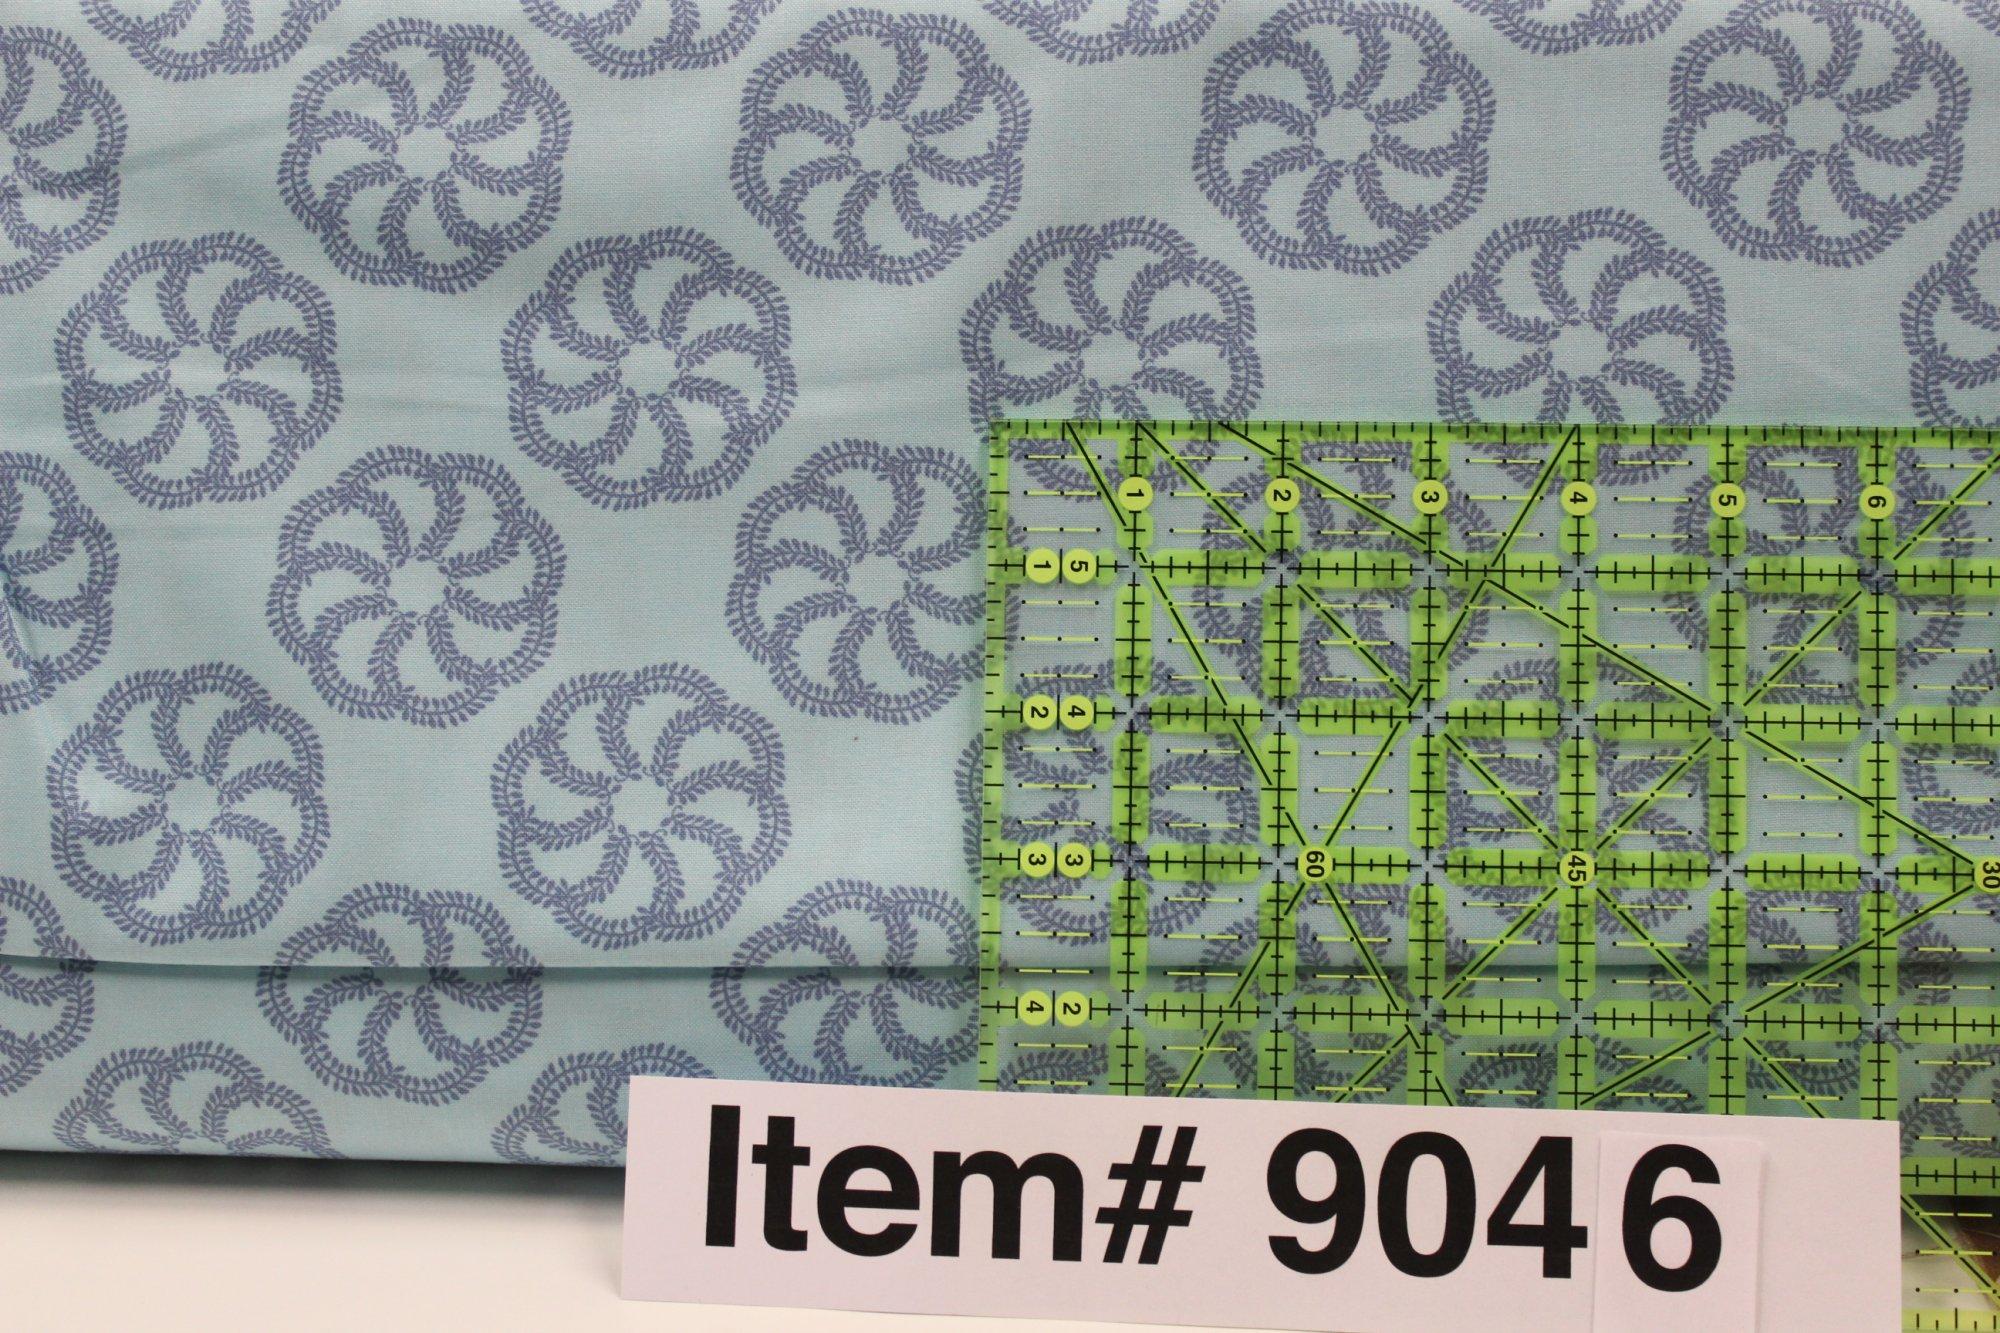 Item#9046 - Aria Fern Sky - Moda - Kate Spain - Bolt#9046